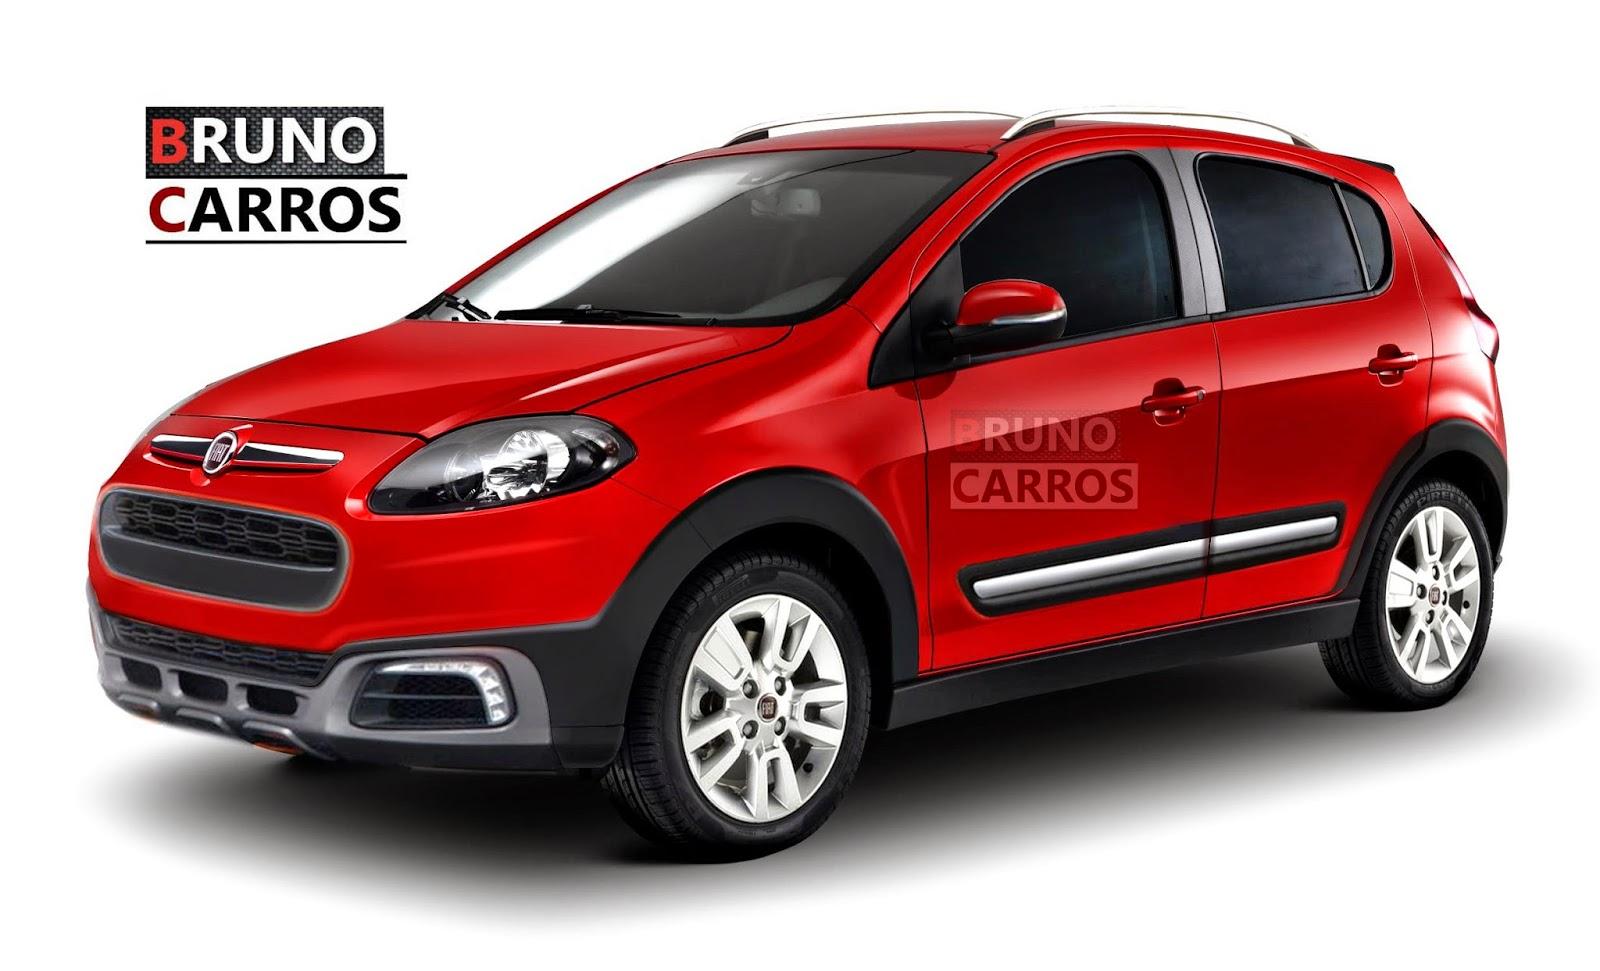 Fiat uno 2014 price in india autos post for Fiat attractive 2016